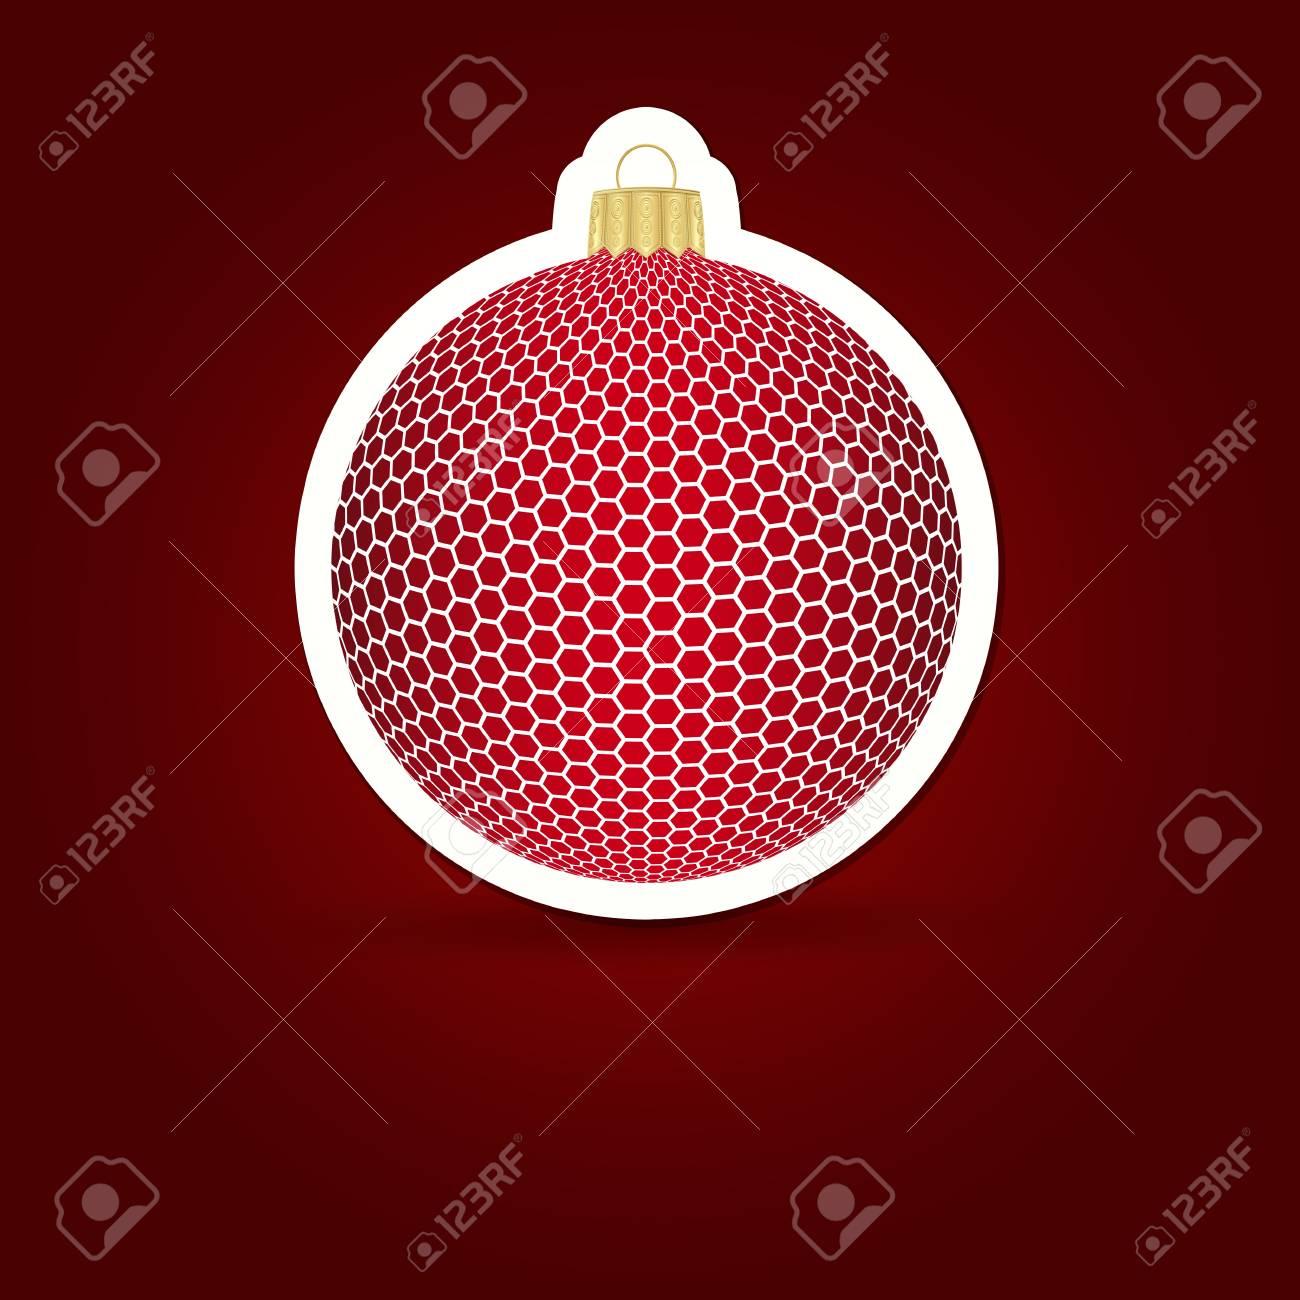 Christmas background. Sticker ball. Vector illustration. Stock Vector - 20168379